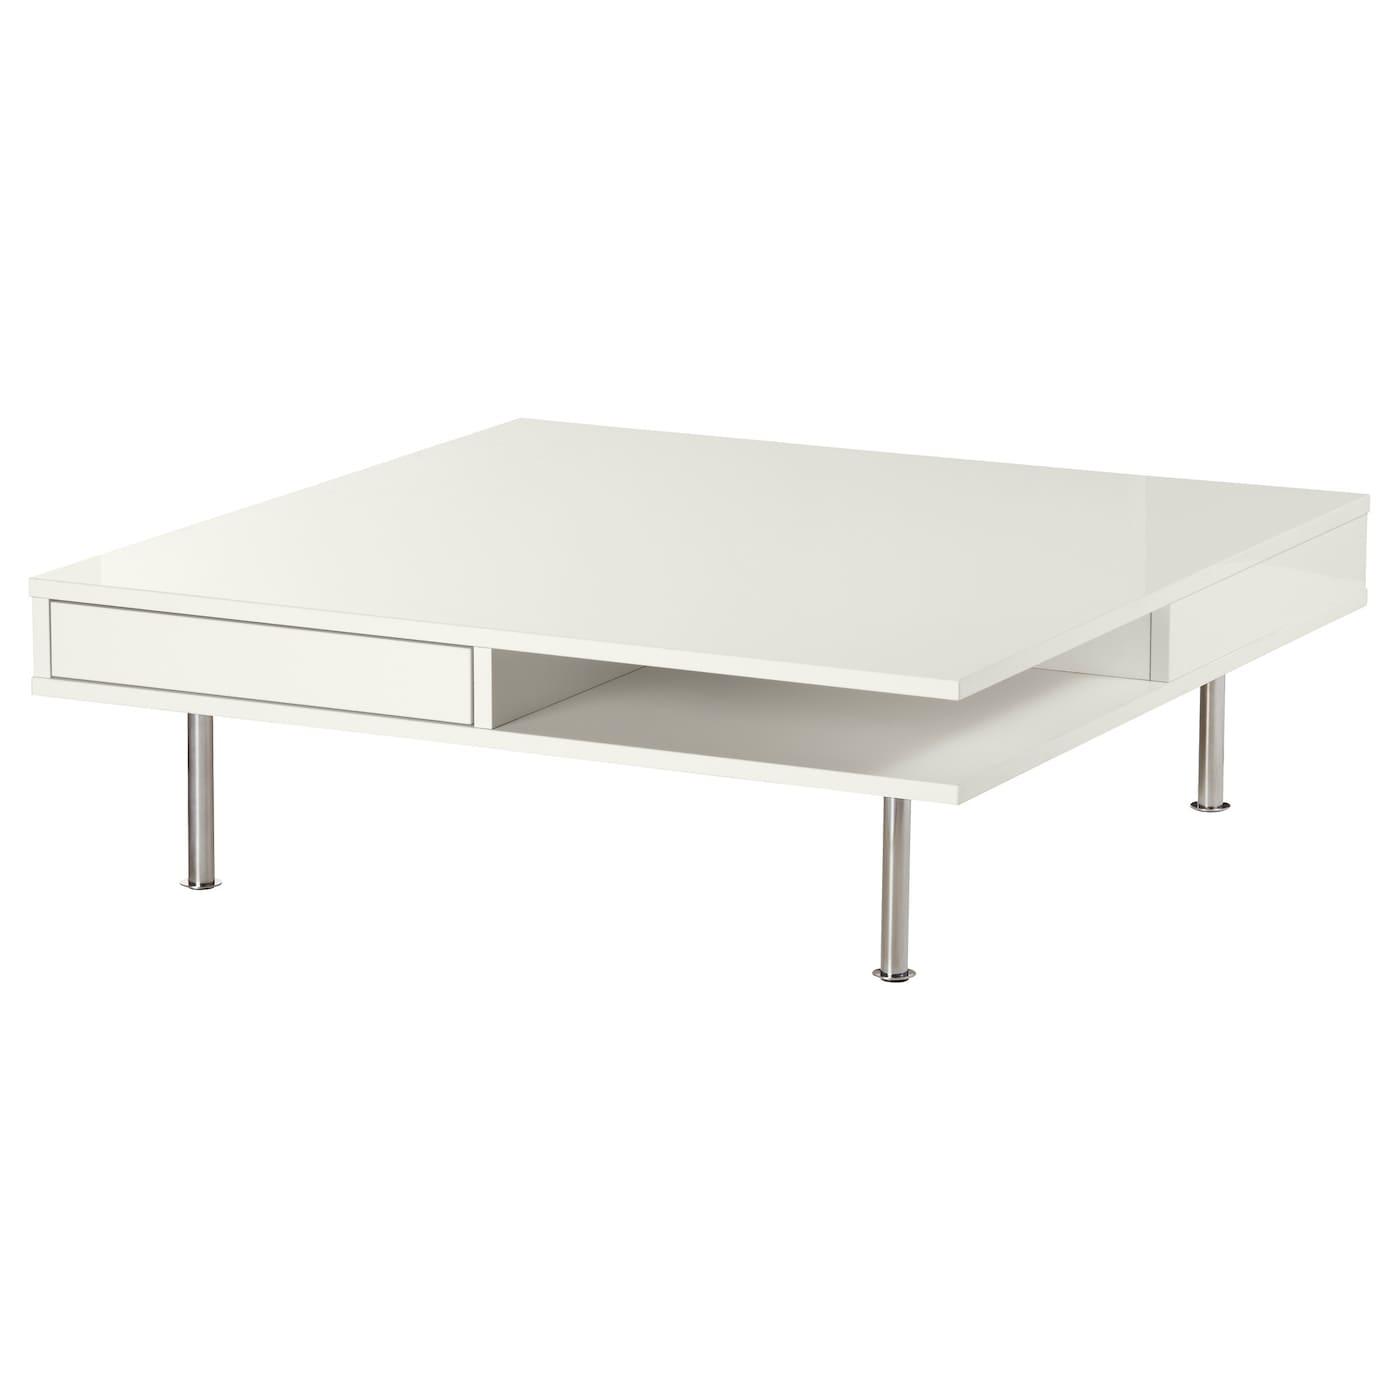 Tofteryd Coffee Table High Gloss White 37 3 8x37 3 8 Ikea